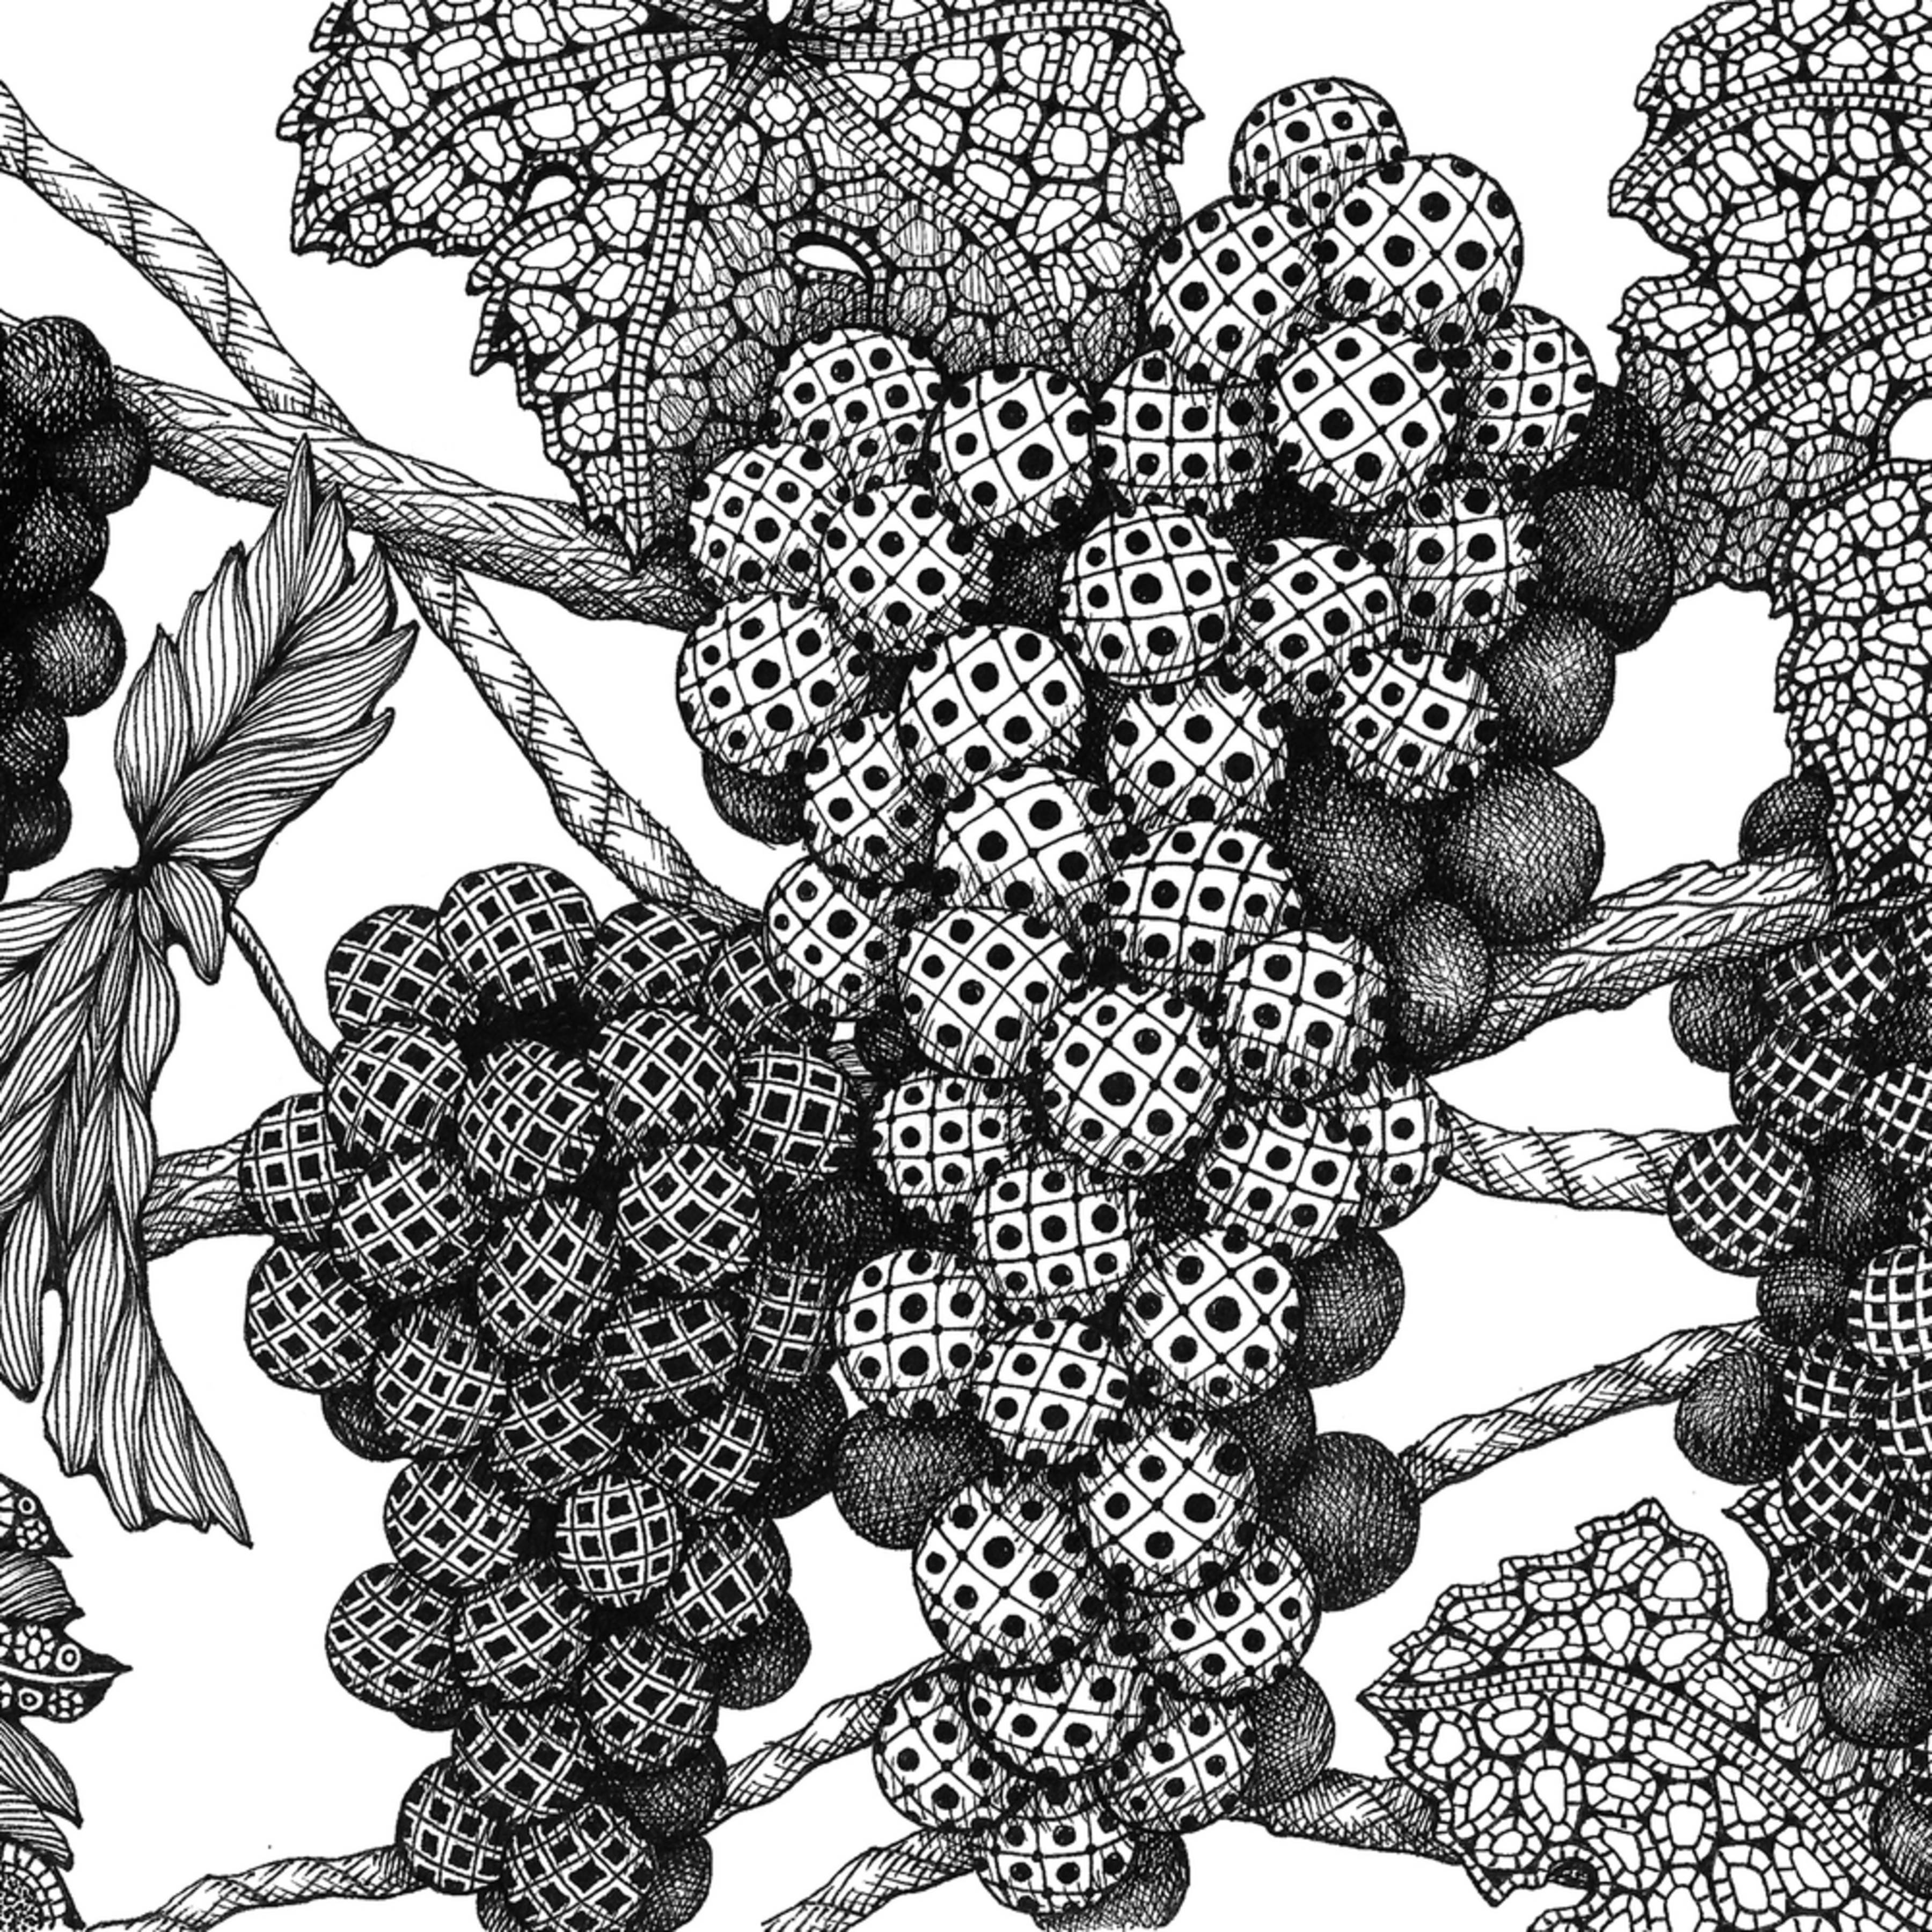 Grapes on the vine uw3vhi